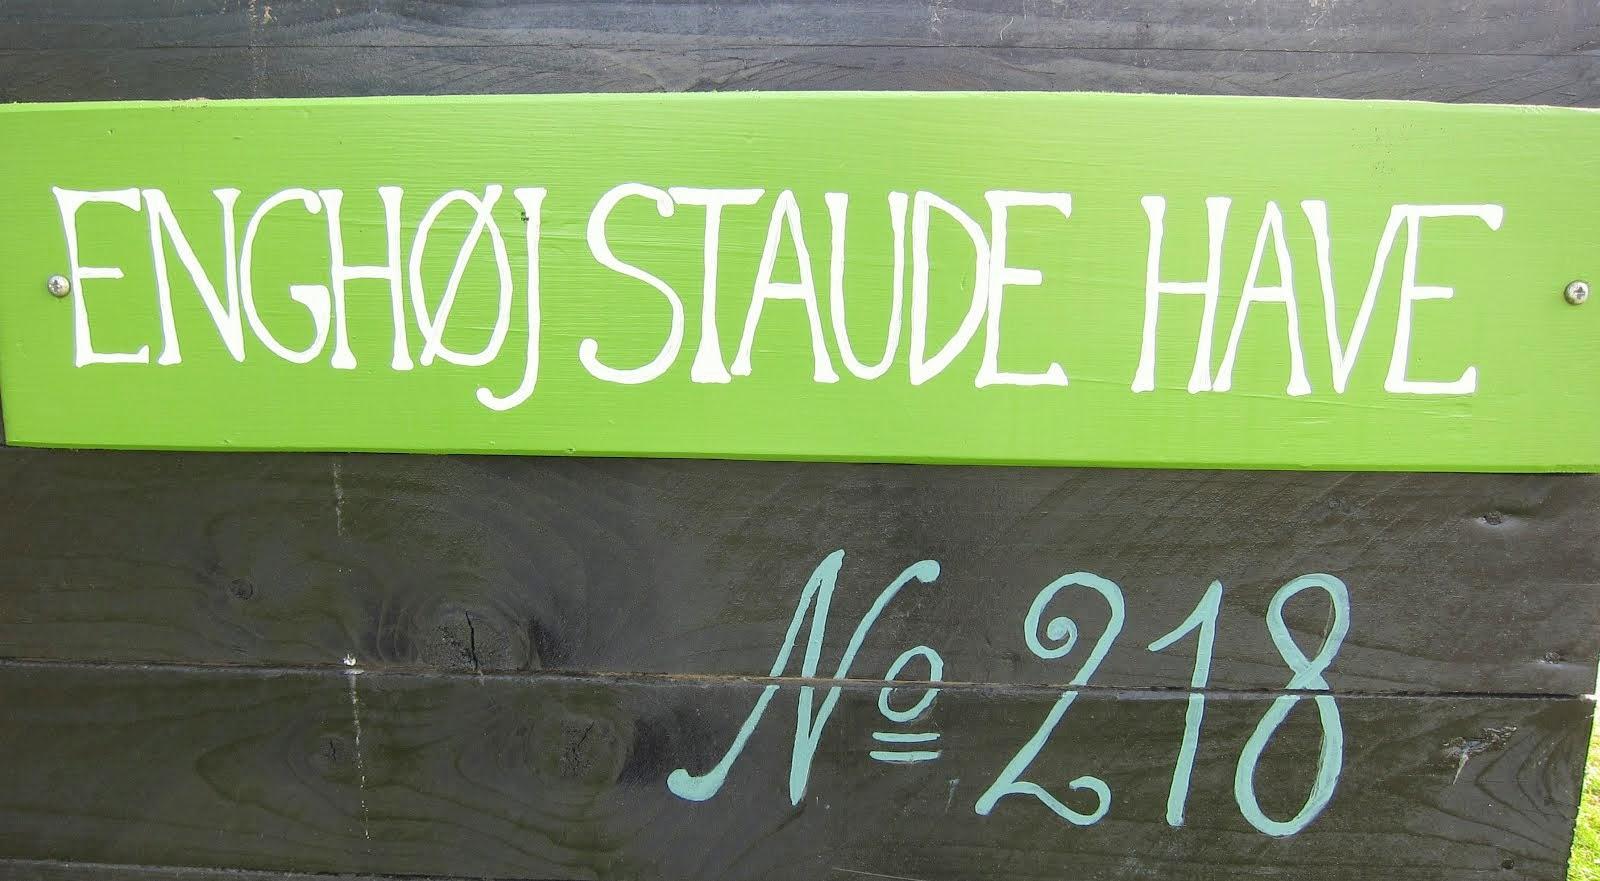 Enghøj Staude Have